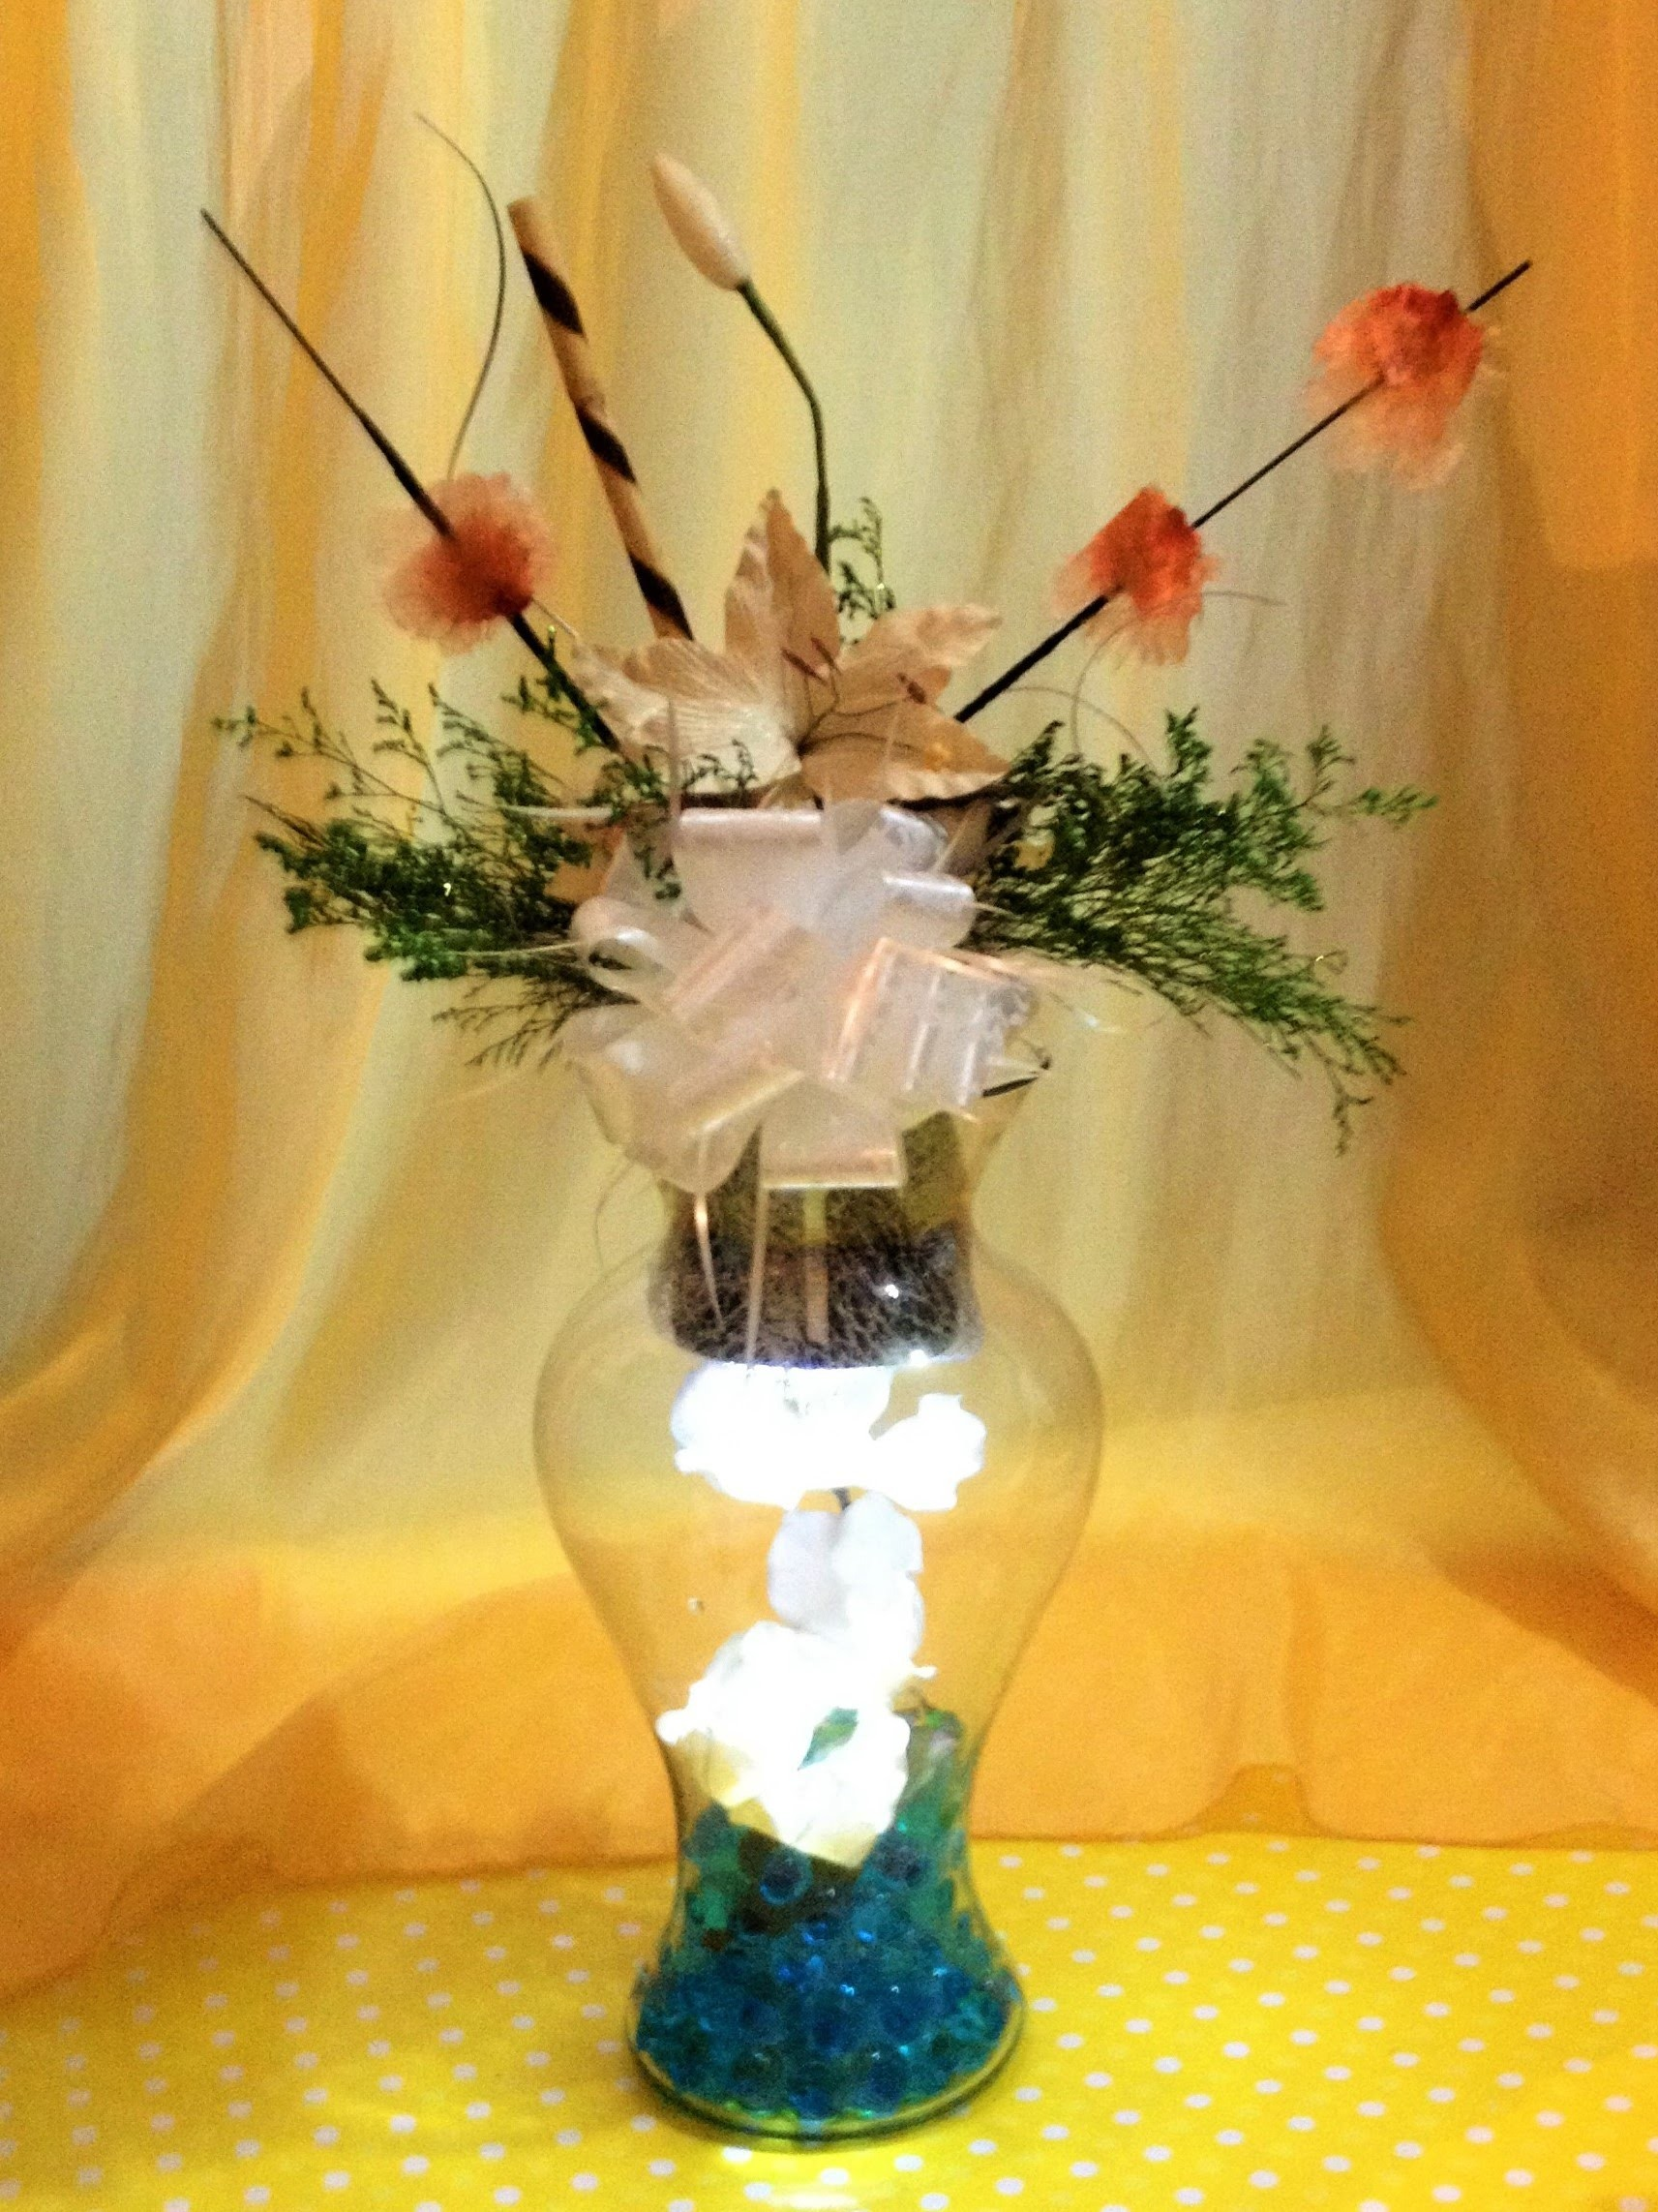 DIY centro de mesa boda XV años elegante fácil lámpara center wedding table lamp